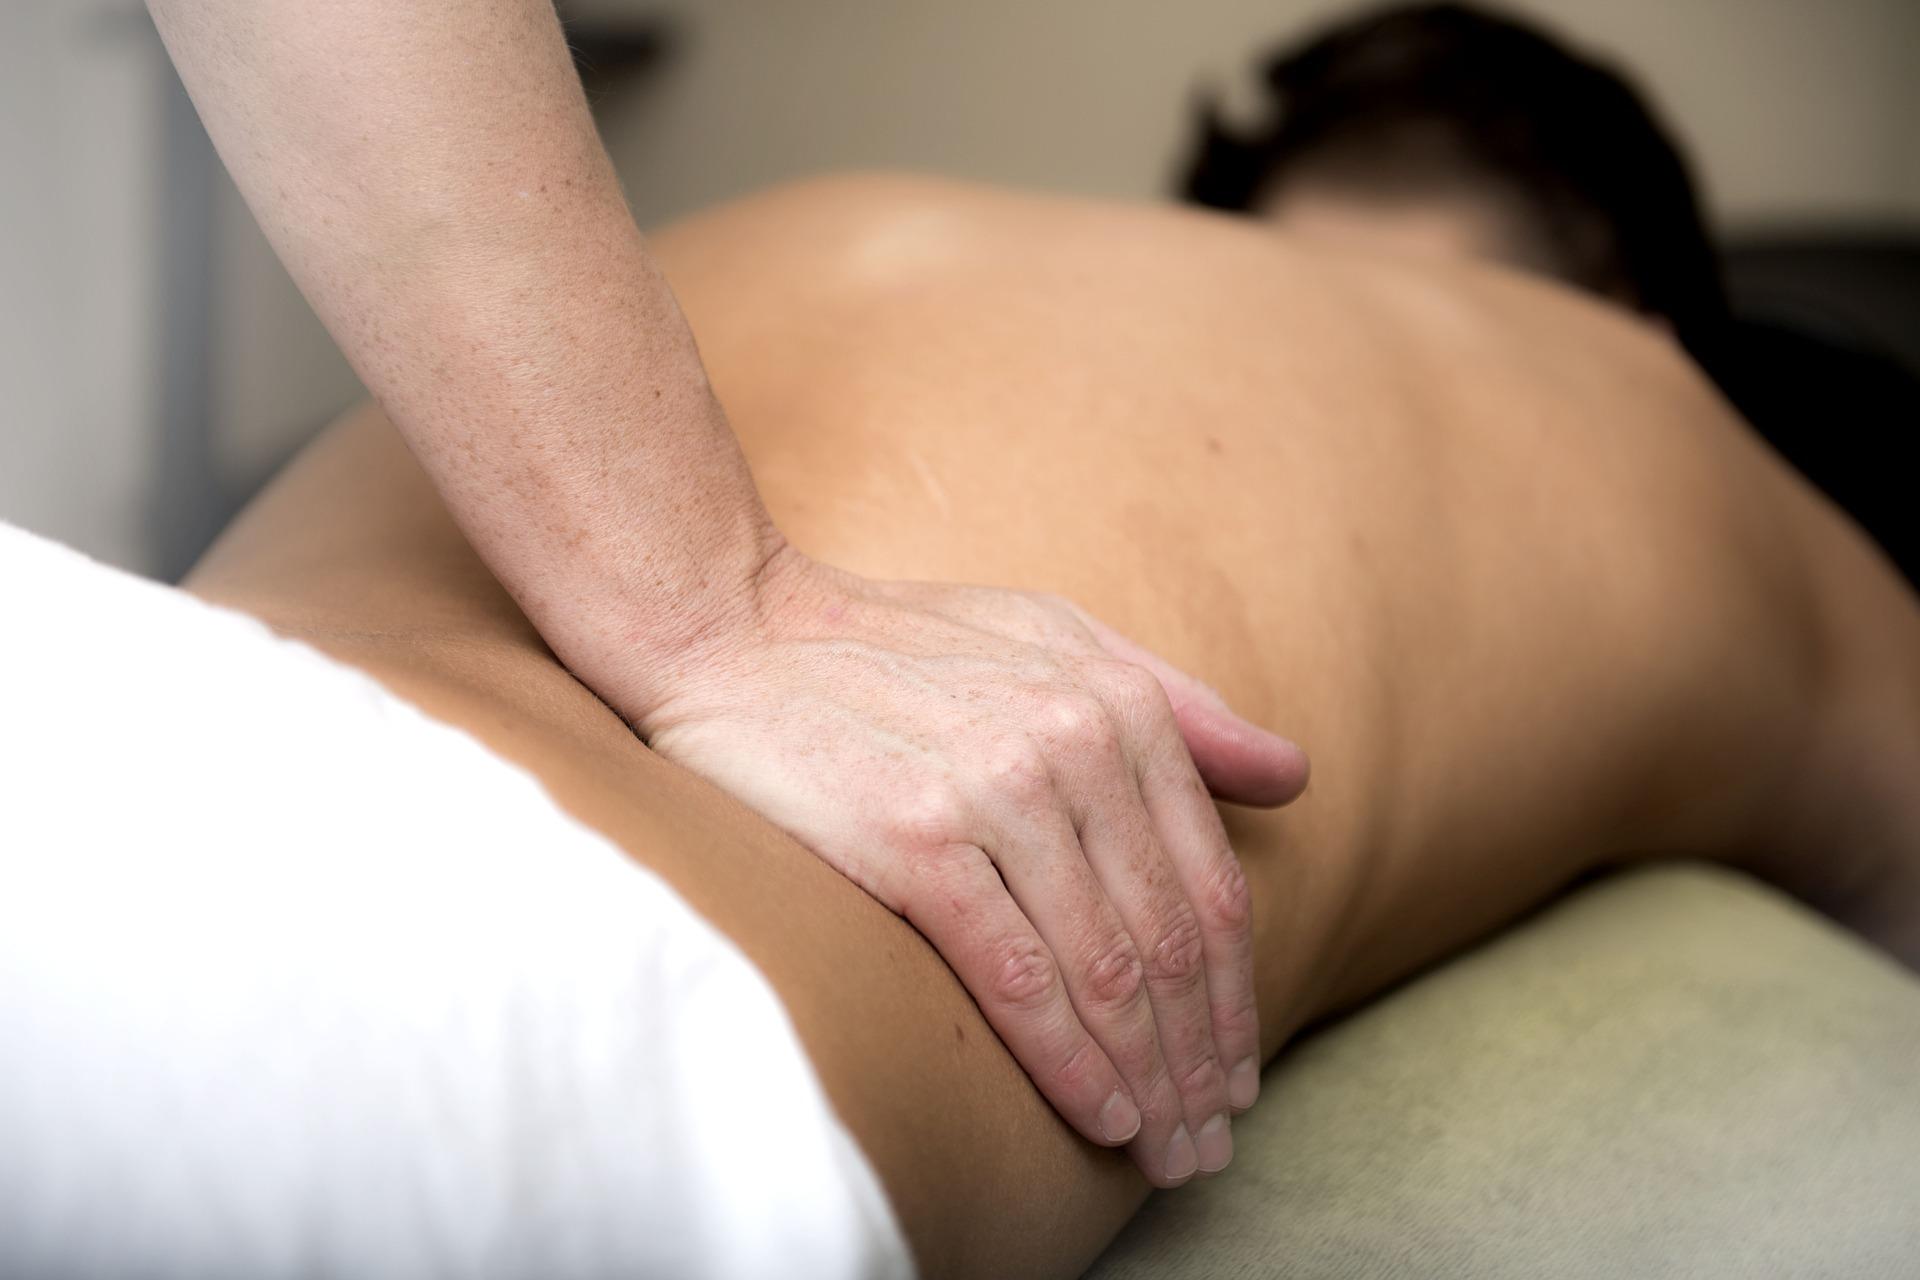 massage-3795692_1920.jpg